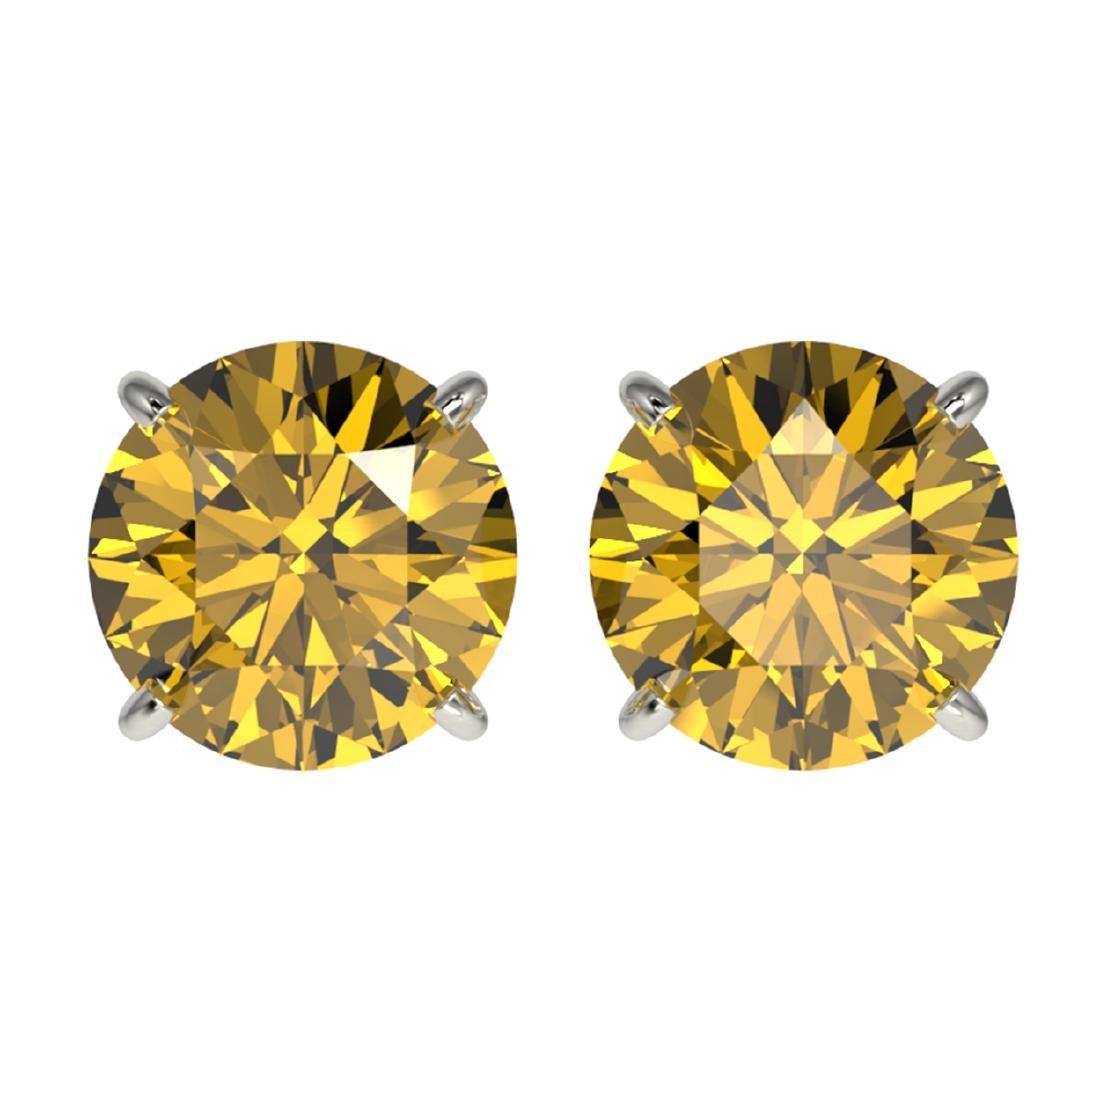 3 ctw Intense Yellow Diamond Stud Earrings 10K White